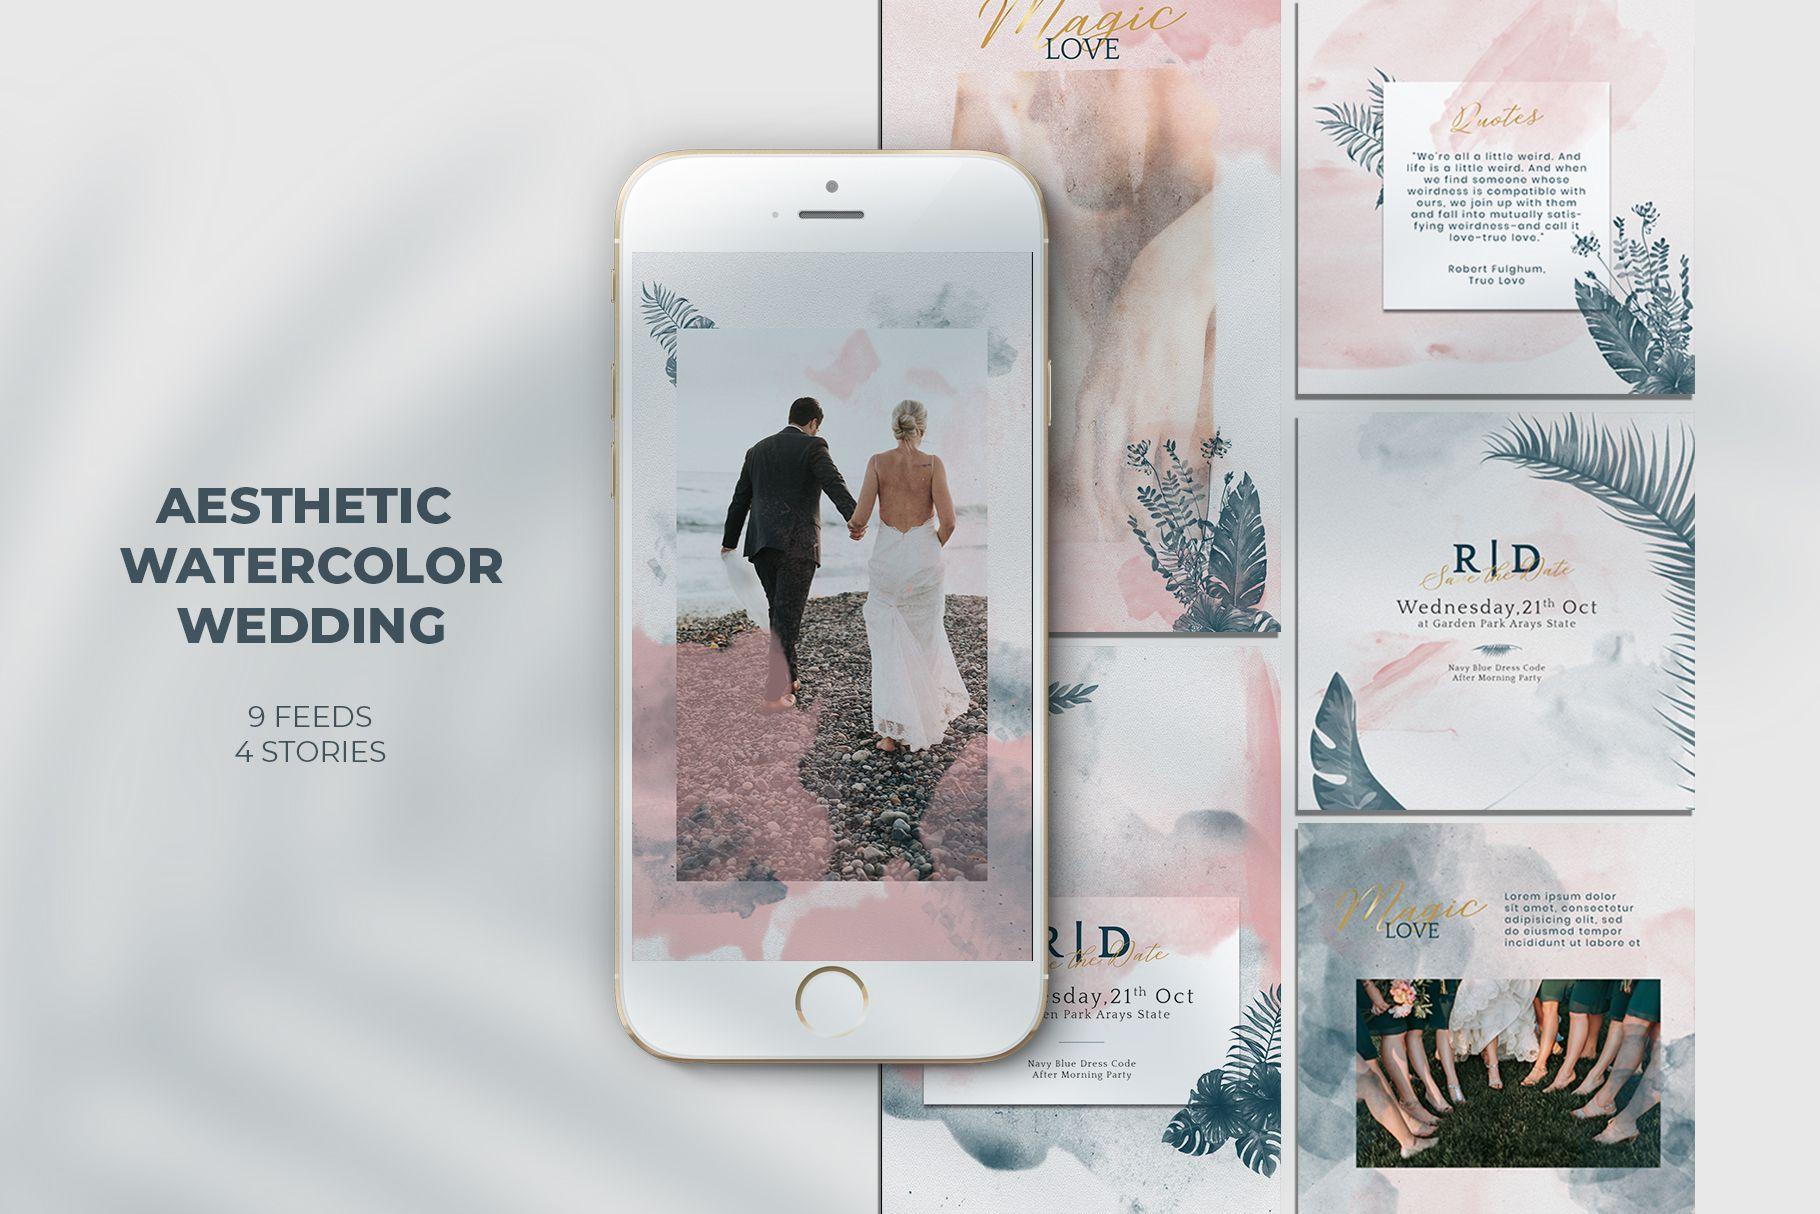 Aesthetic Watercolor Wedding Instagram Templates